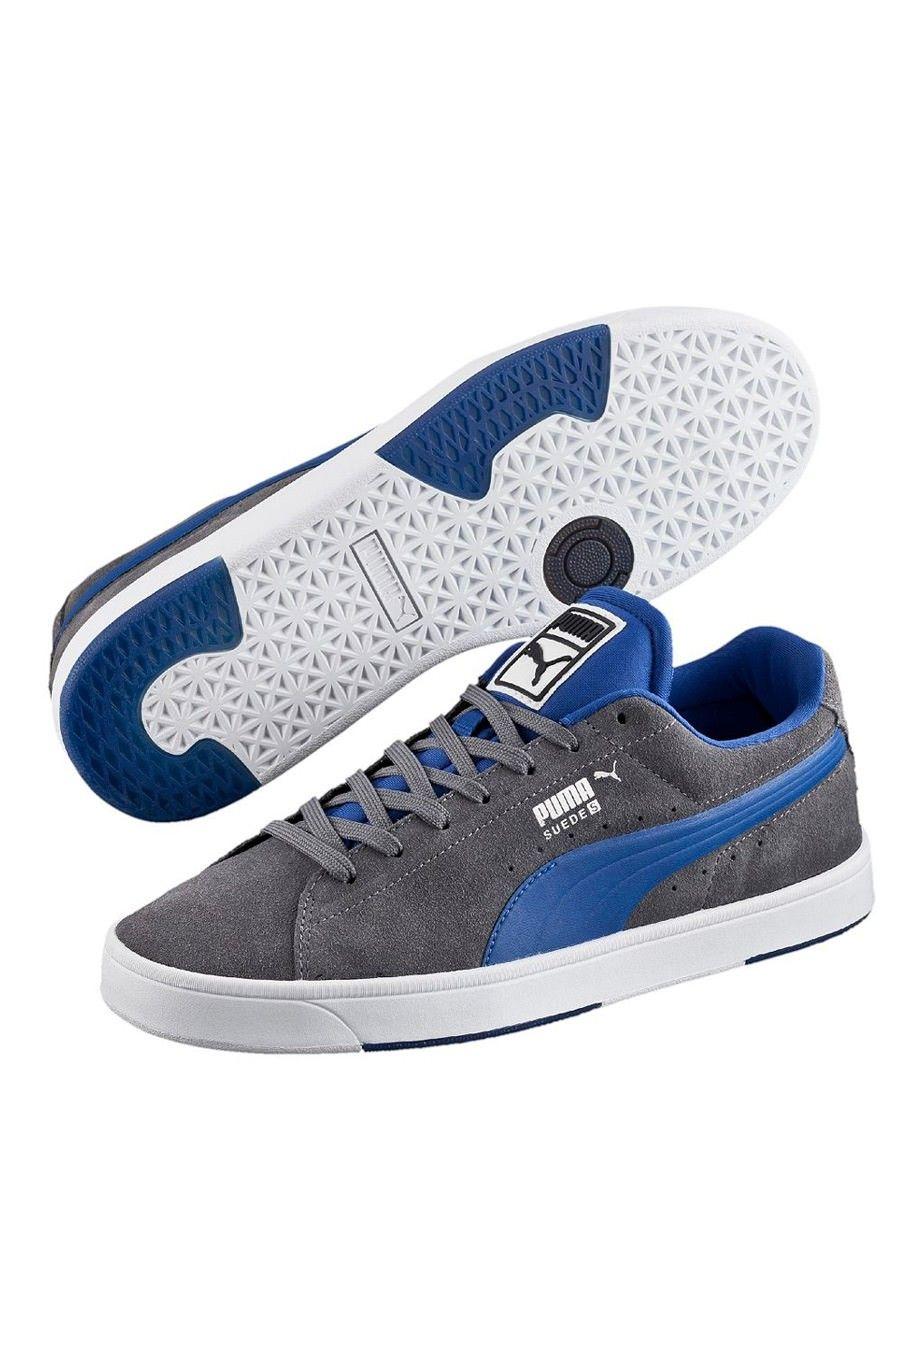 Scarpa Puma Suede S Steel Gray. Puma SuedeMen\u0027s SneakersPumasOutlets